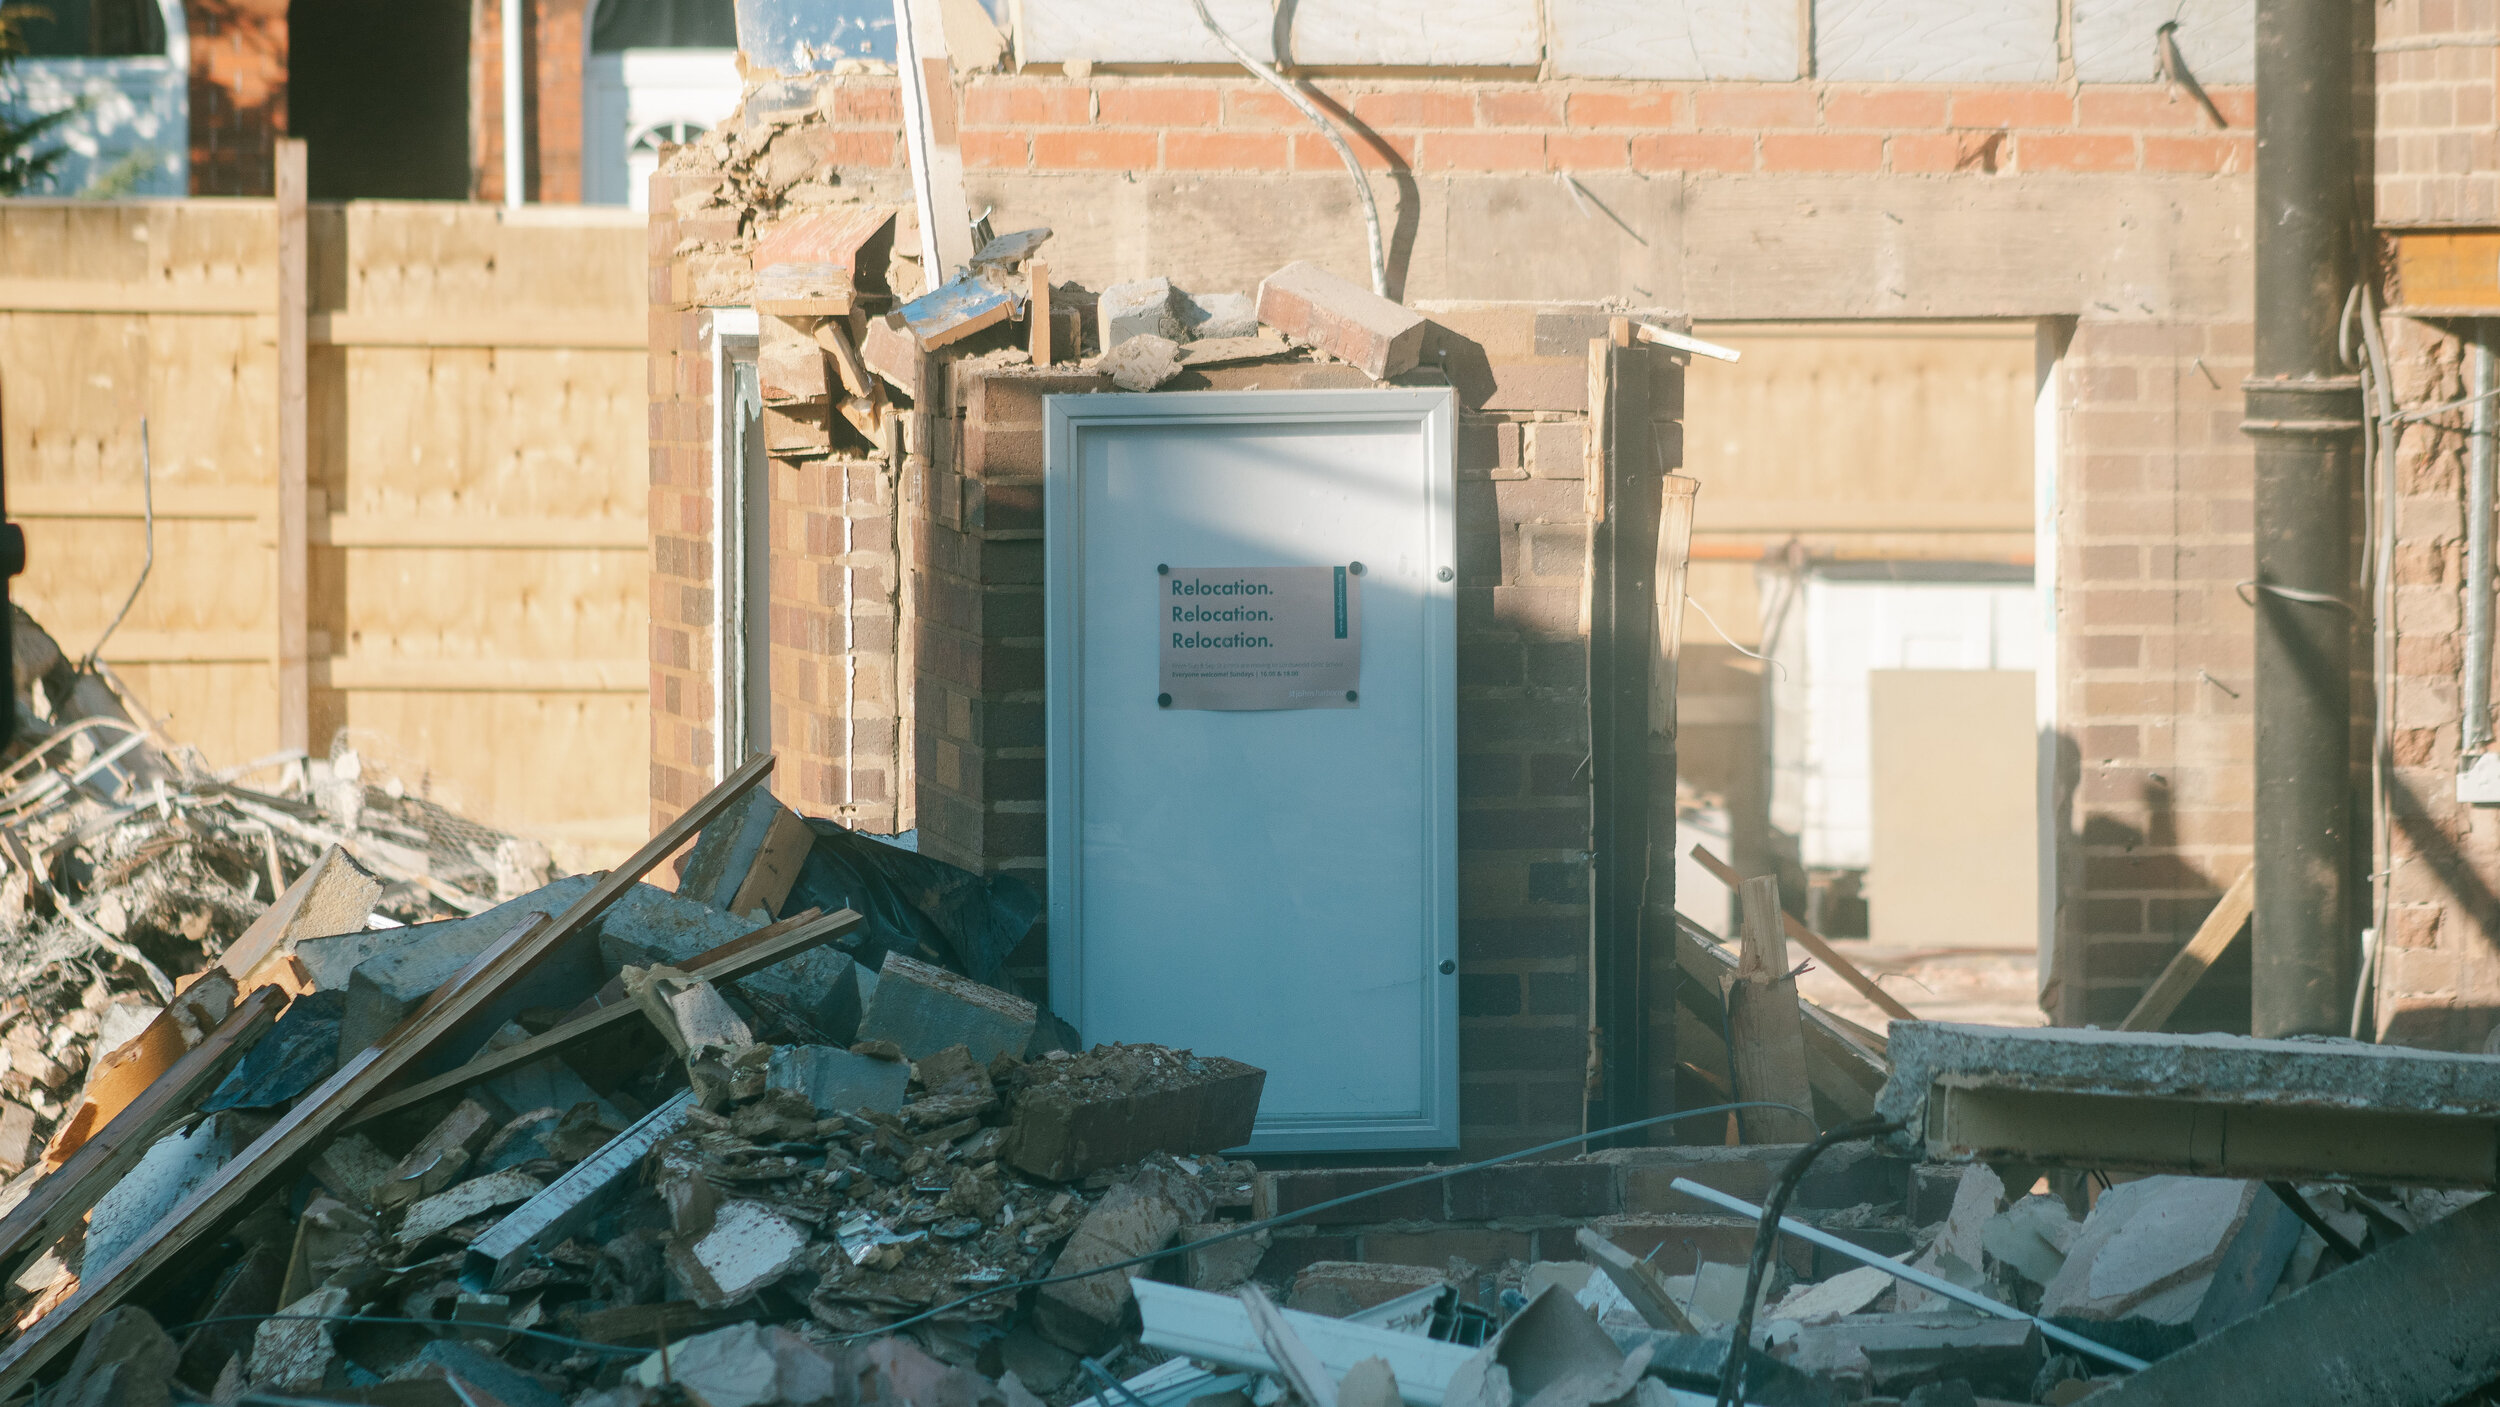 st-johns-harborne-bfm-demolition-oct-19-eo-3041-low.jpg